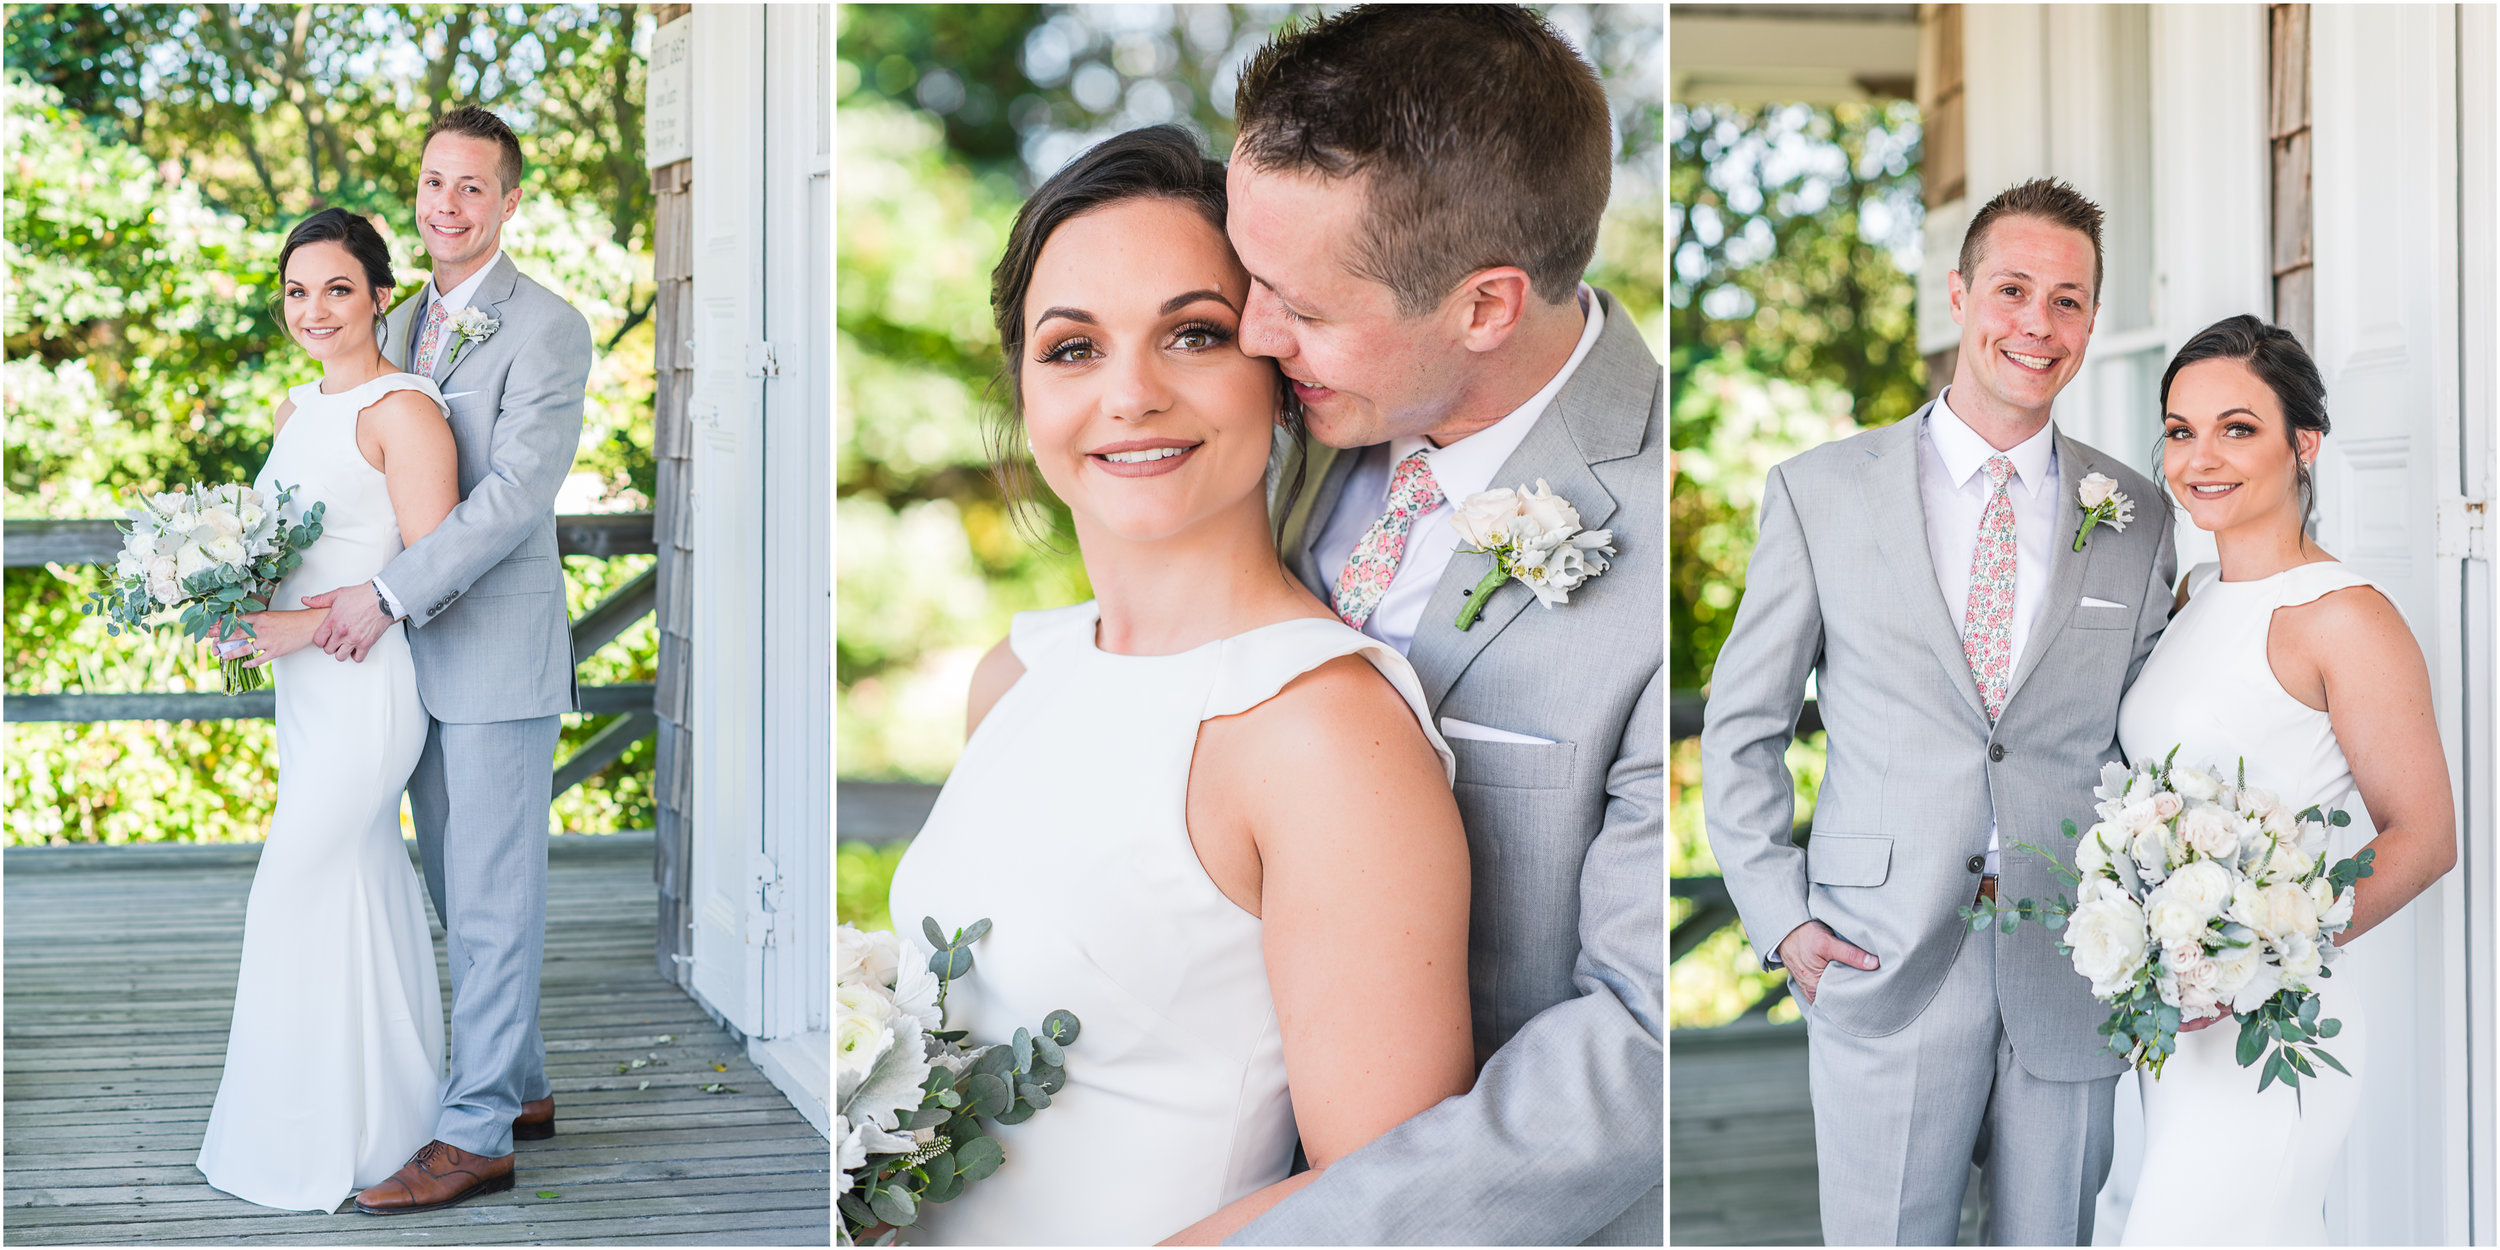 lbi-wedding-arts-foundation-lbi-wedding-photographer-42.jpg